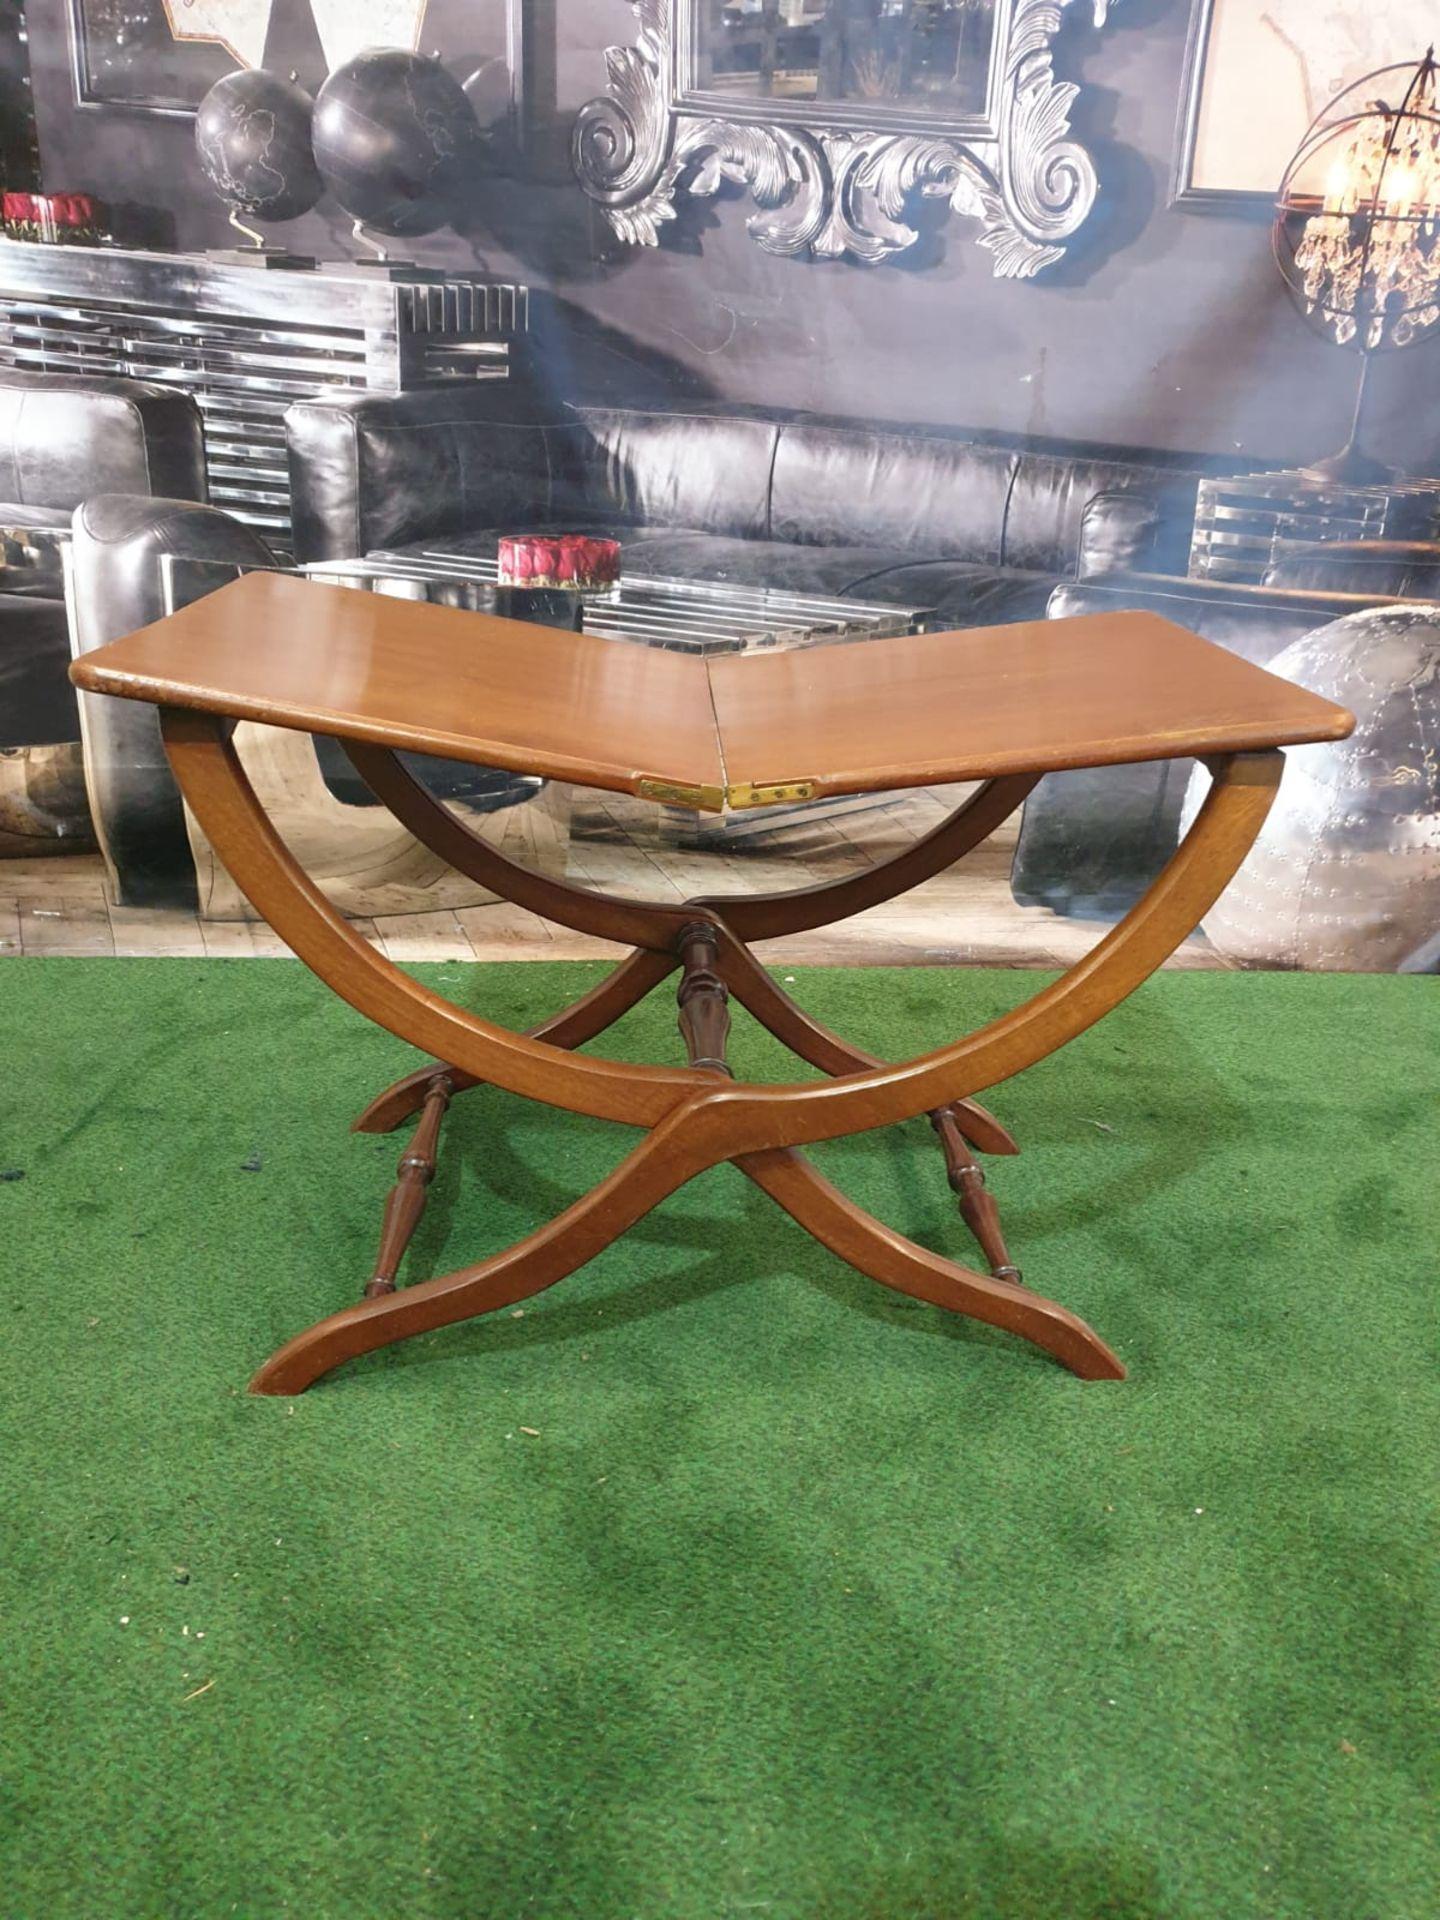 A polished mahogany folding table 76 x 43 x 49cm (Nb bar latch missing) - Image 2 of 5